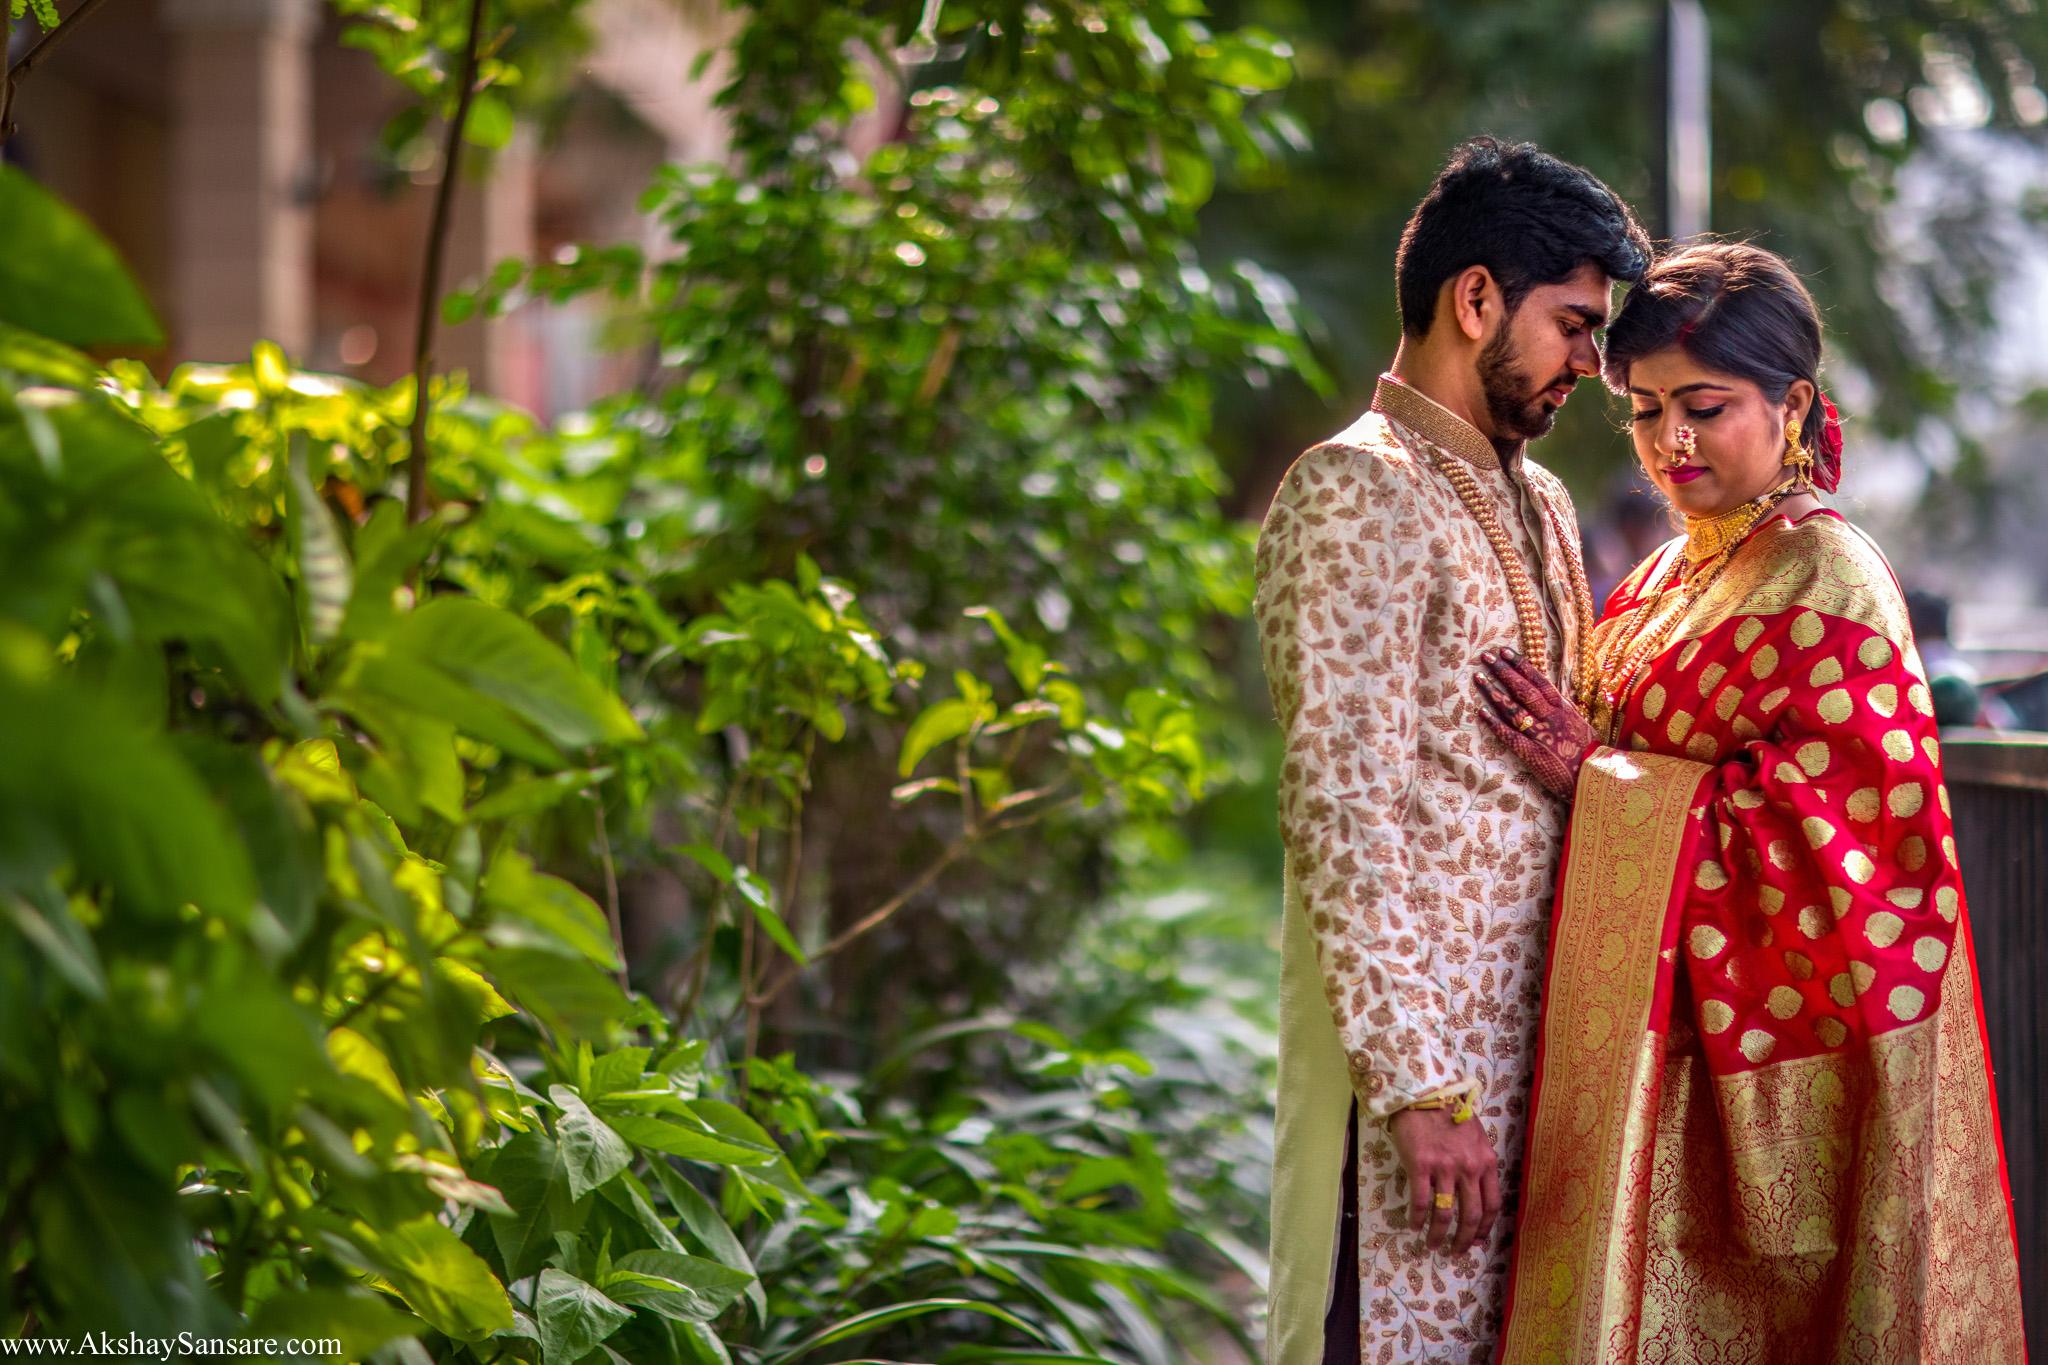 Akshay Sansare Best Candid Photographers in Mumbai (21).jpg